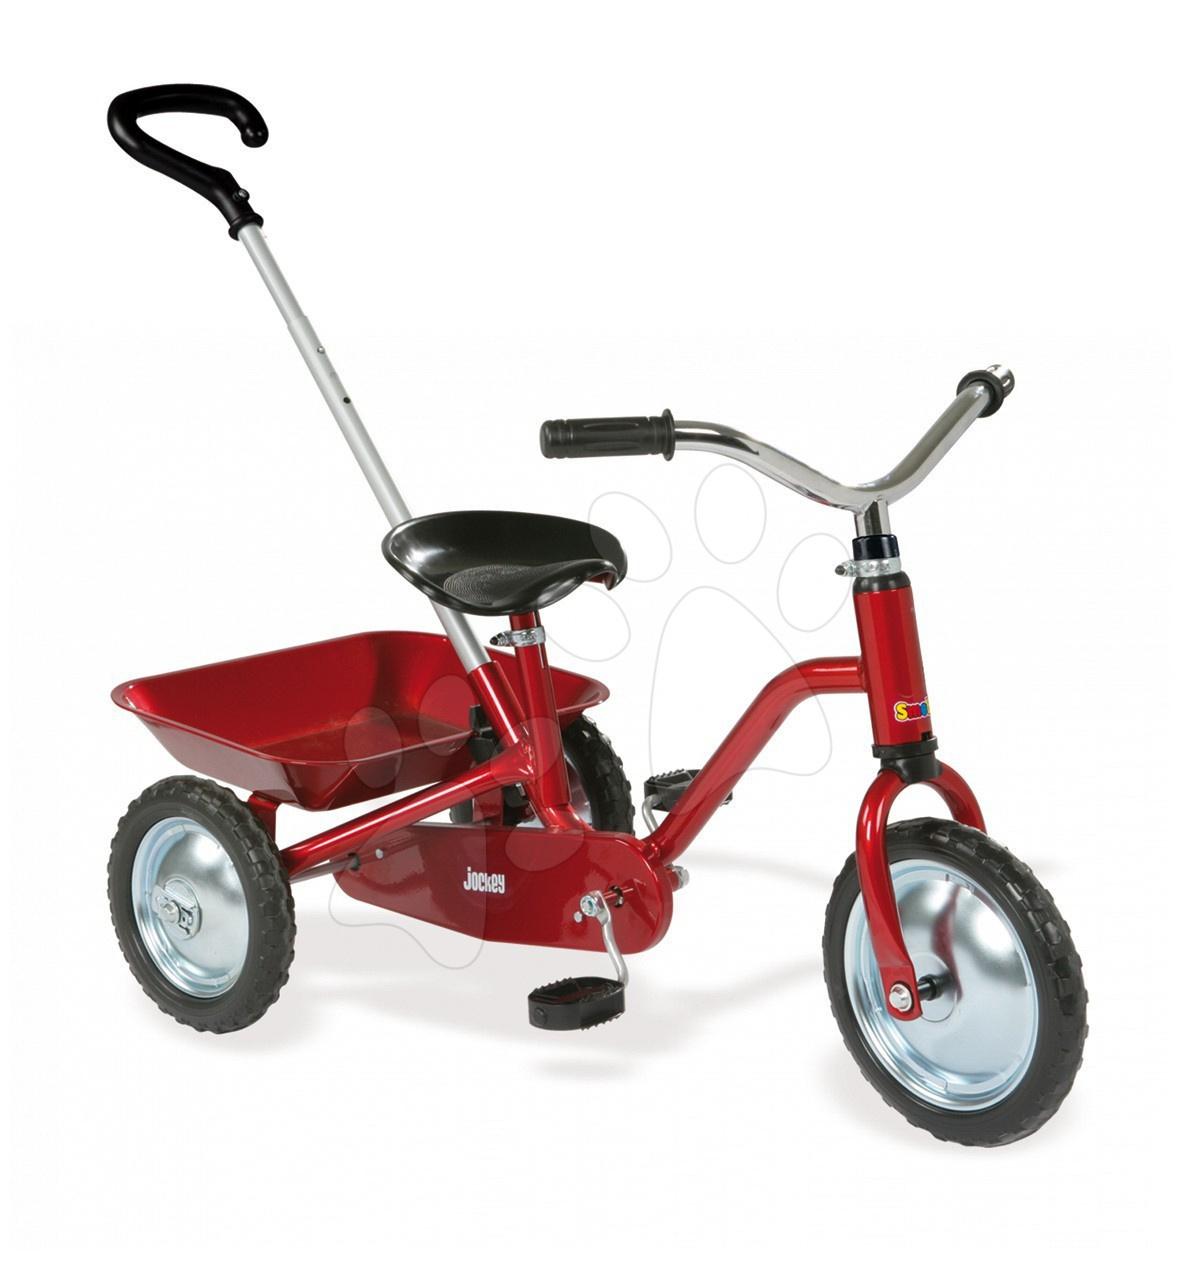 Lánchajtású tricikli Jockey Classic Smoby piros 24 hó-tól